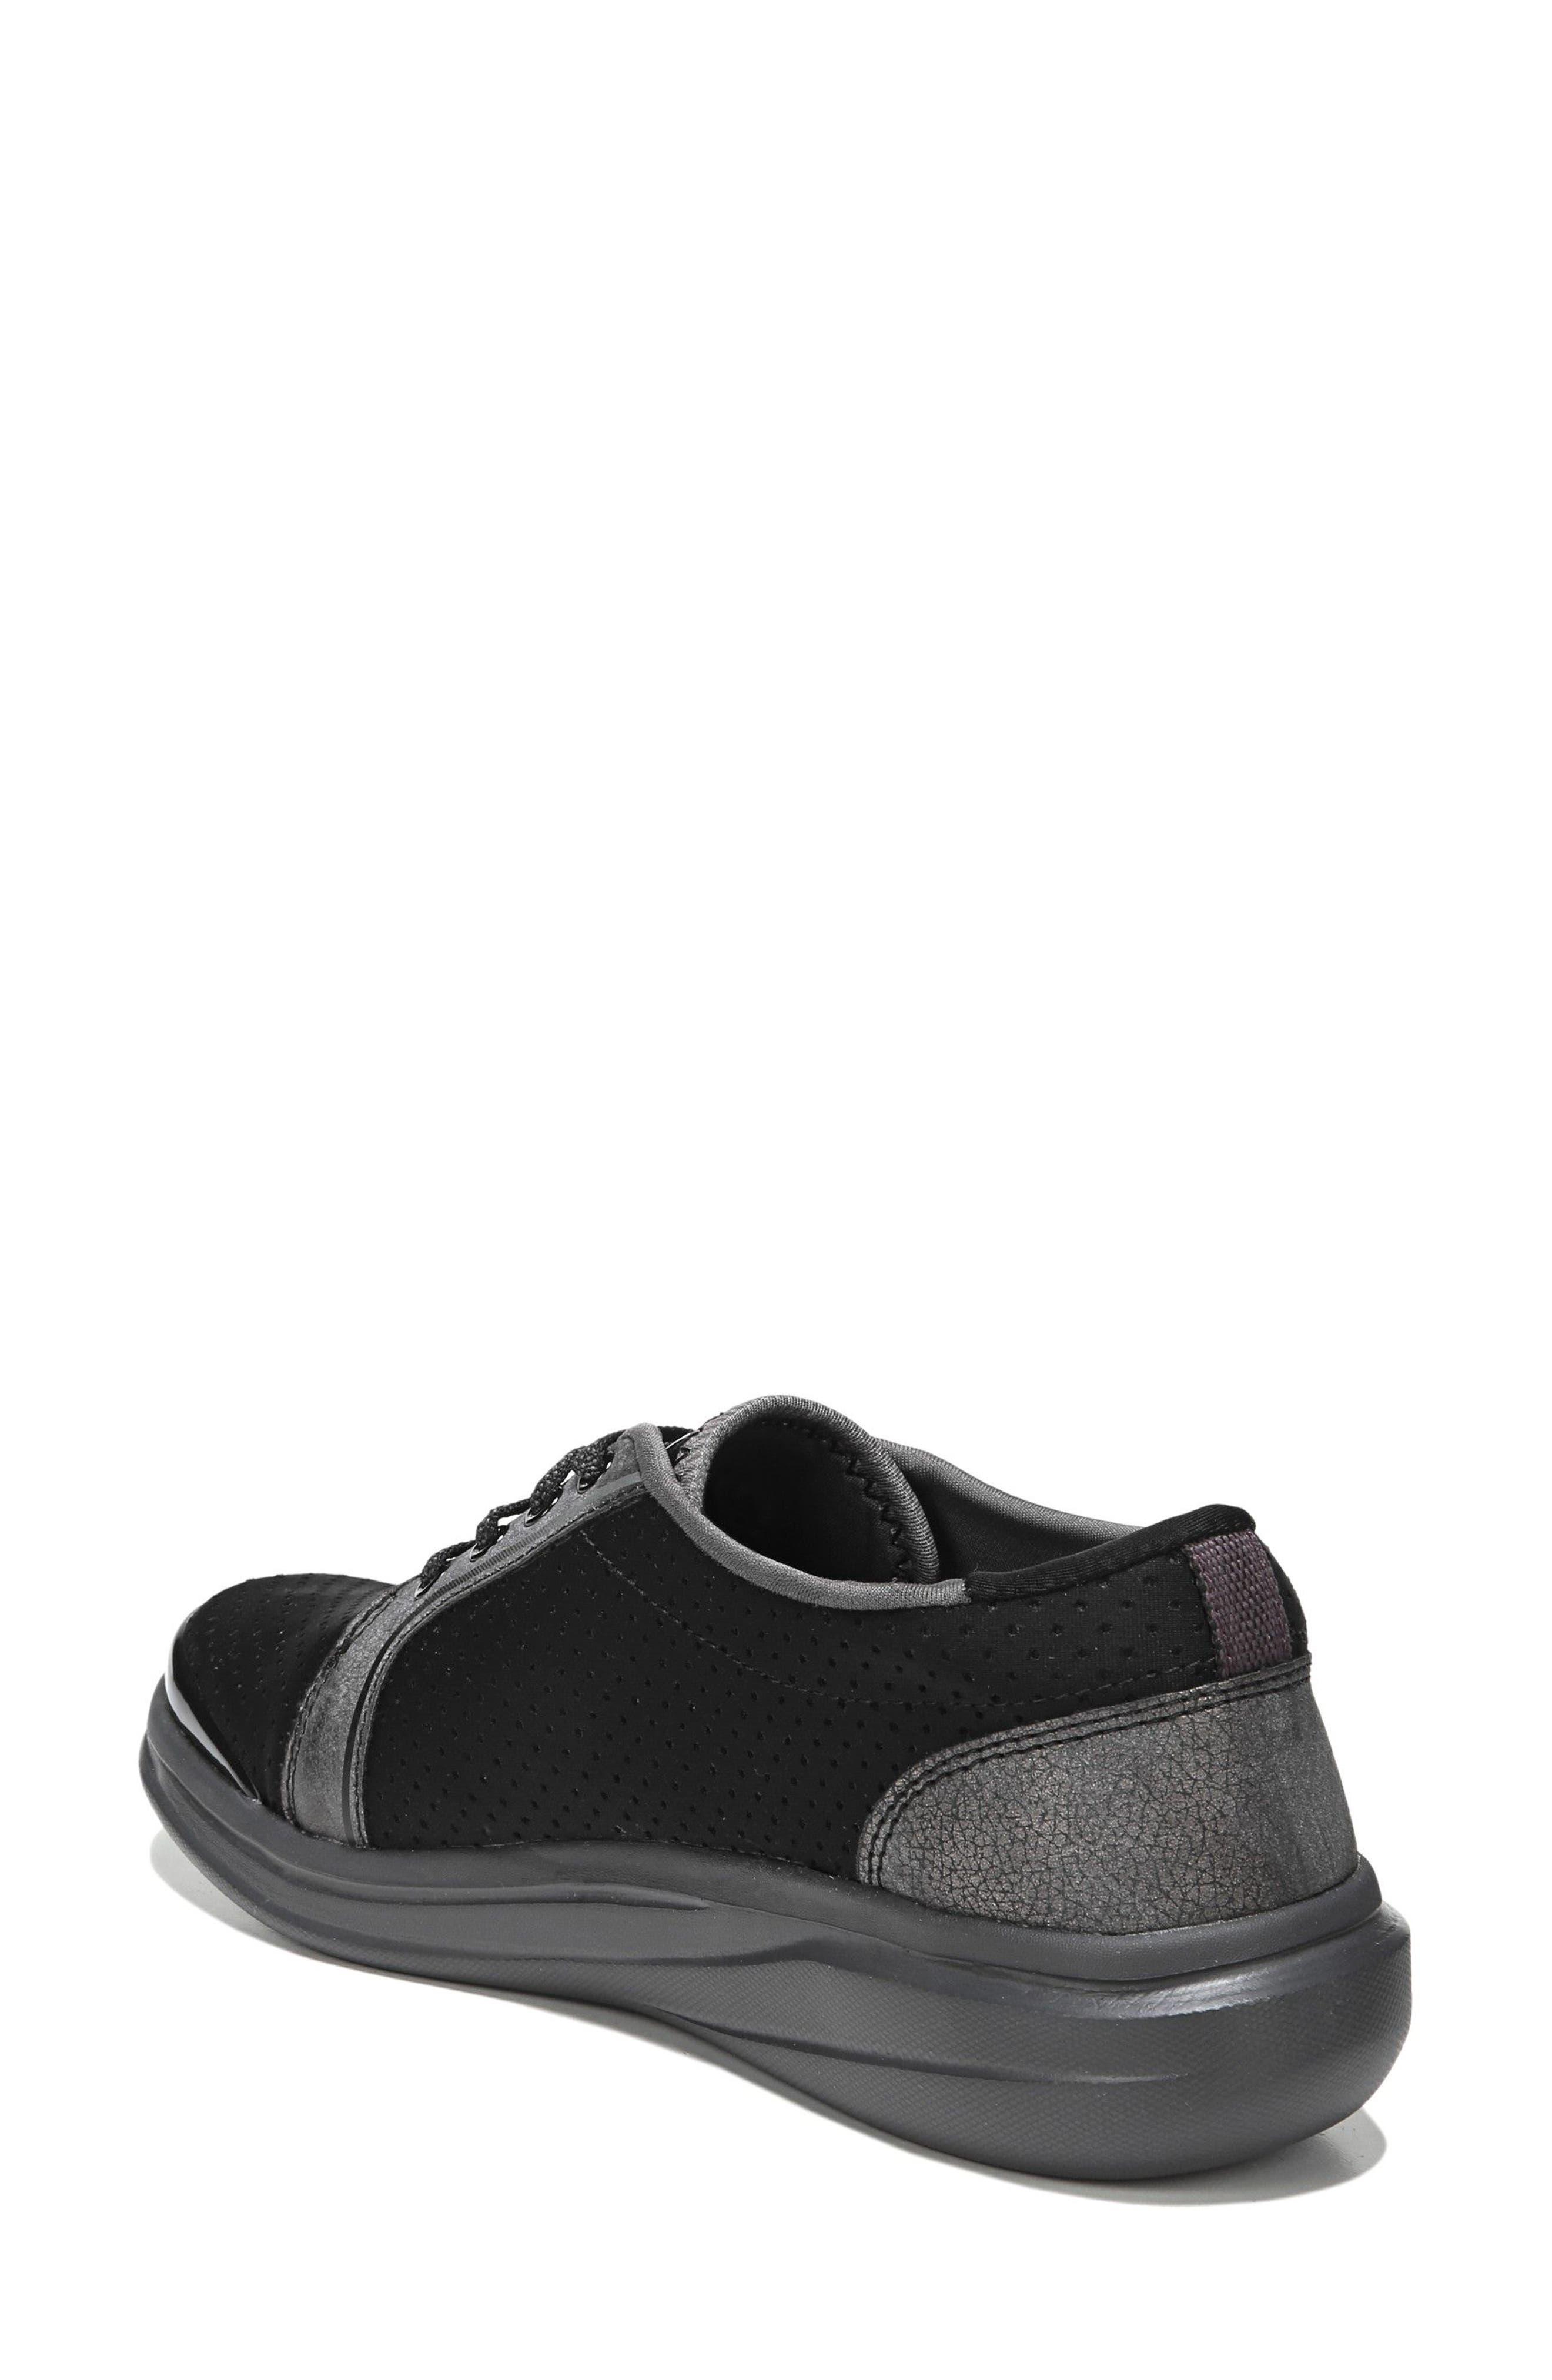 Capri Sneaker,                             Alternate thumbnail 2, color,                             003